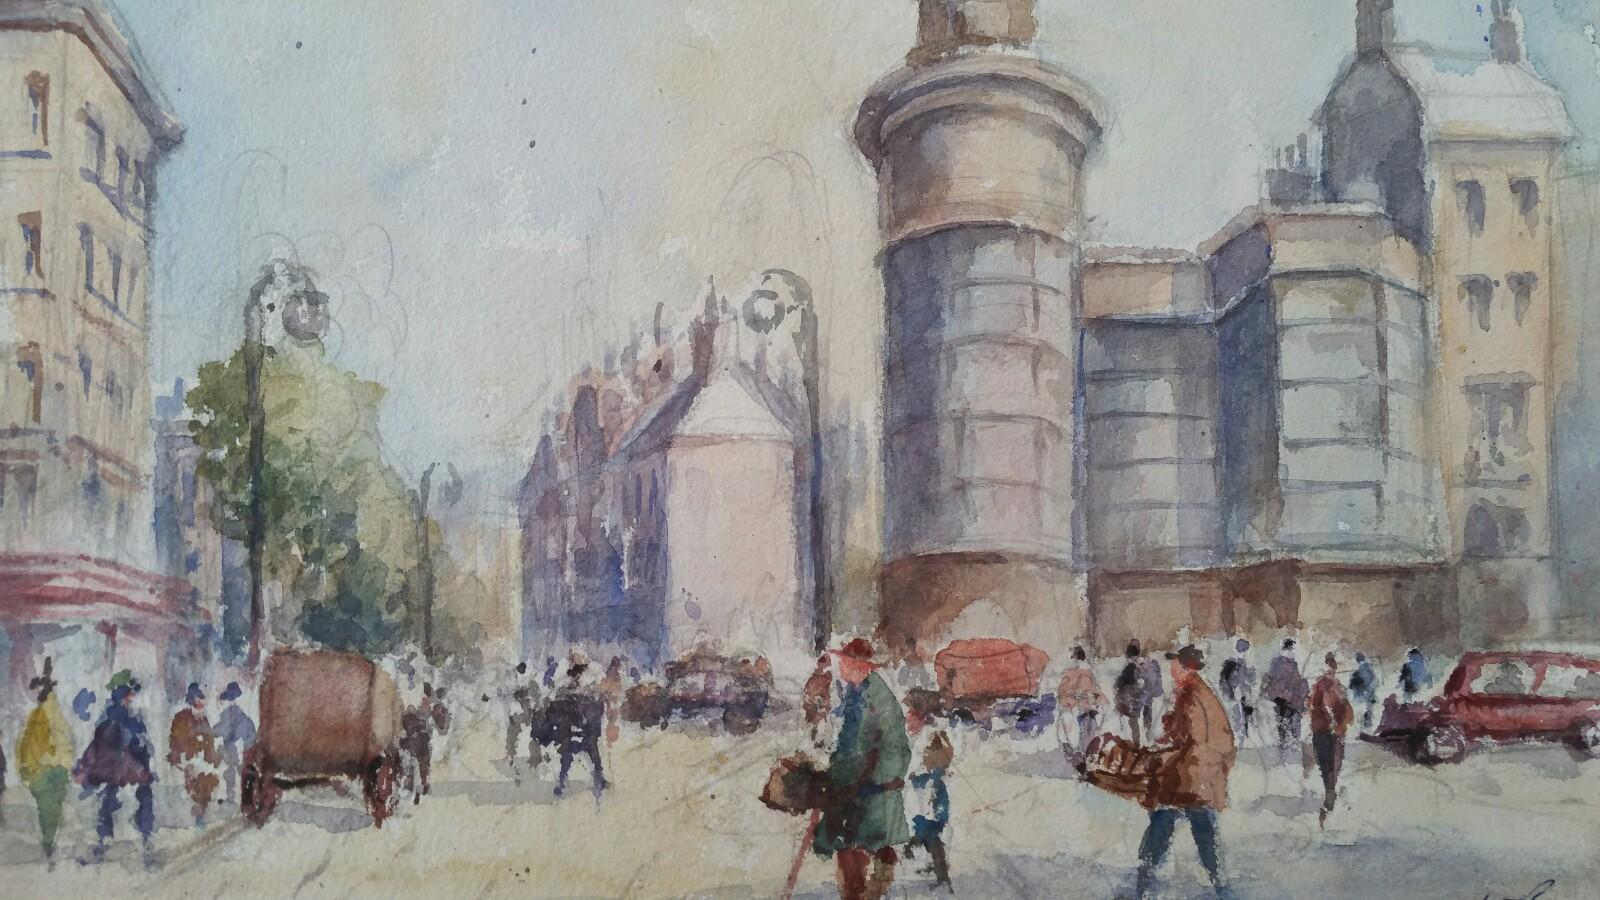 Mid 20th Century, Belgium, A Brussels Street Scene